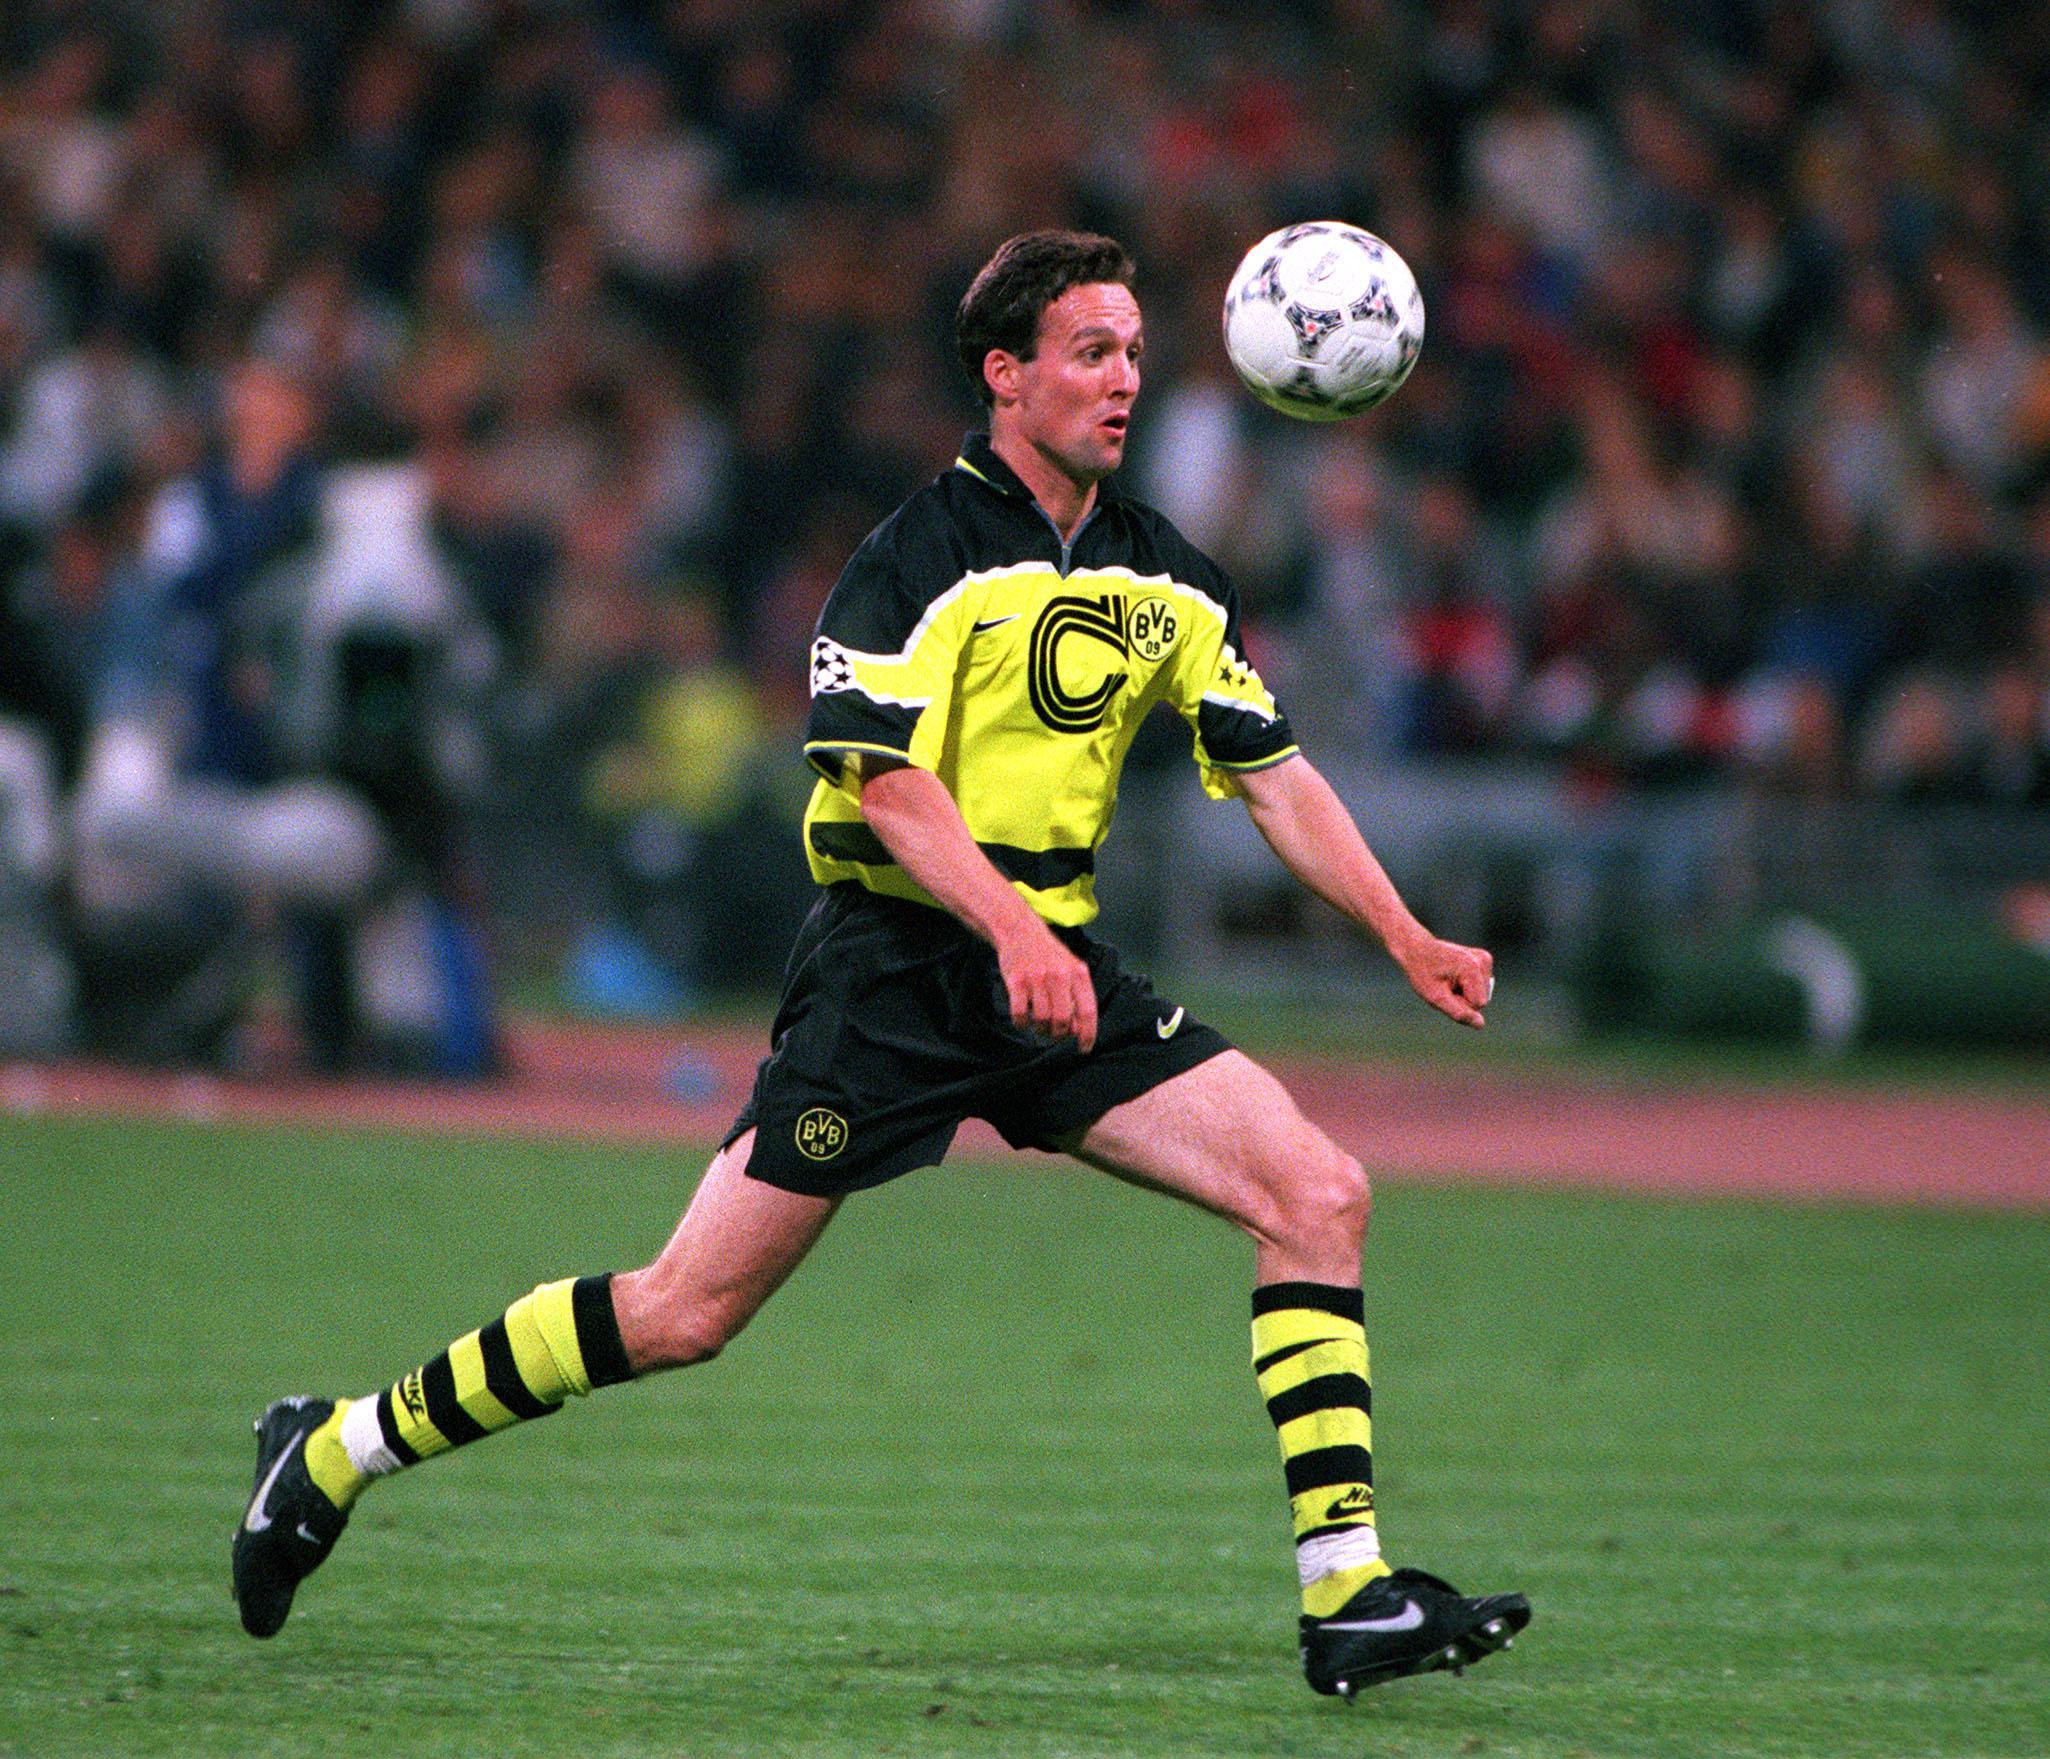 Lambert was converted to a defensive-midfielder at Dortmund